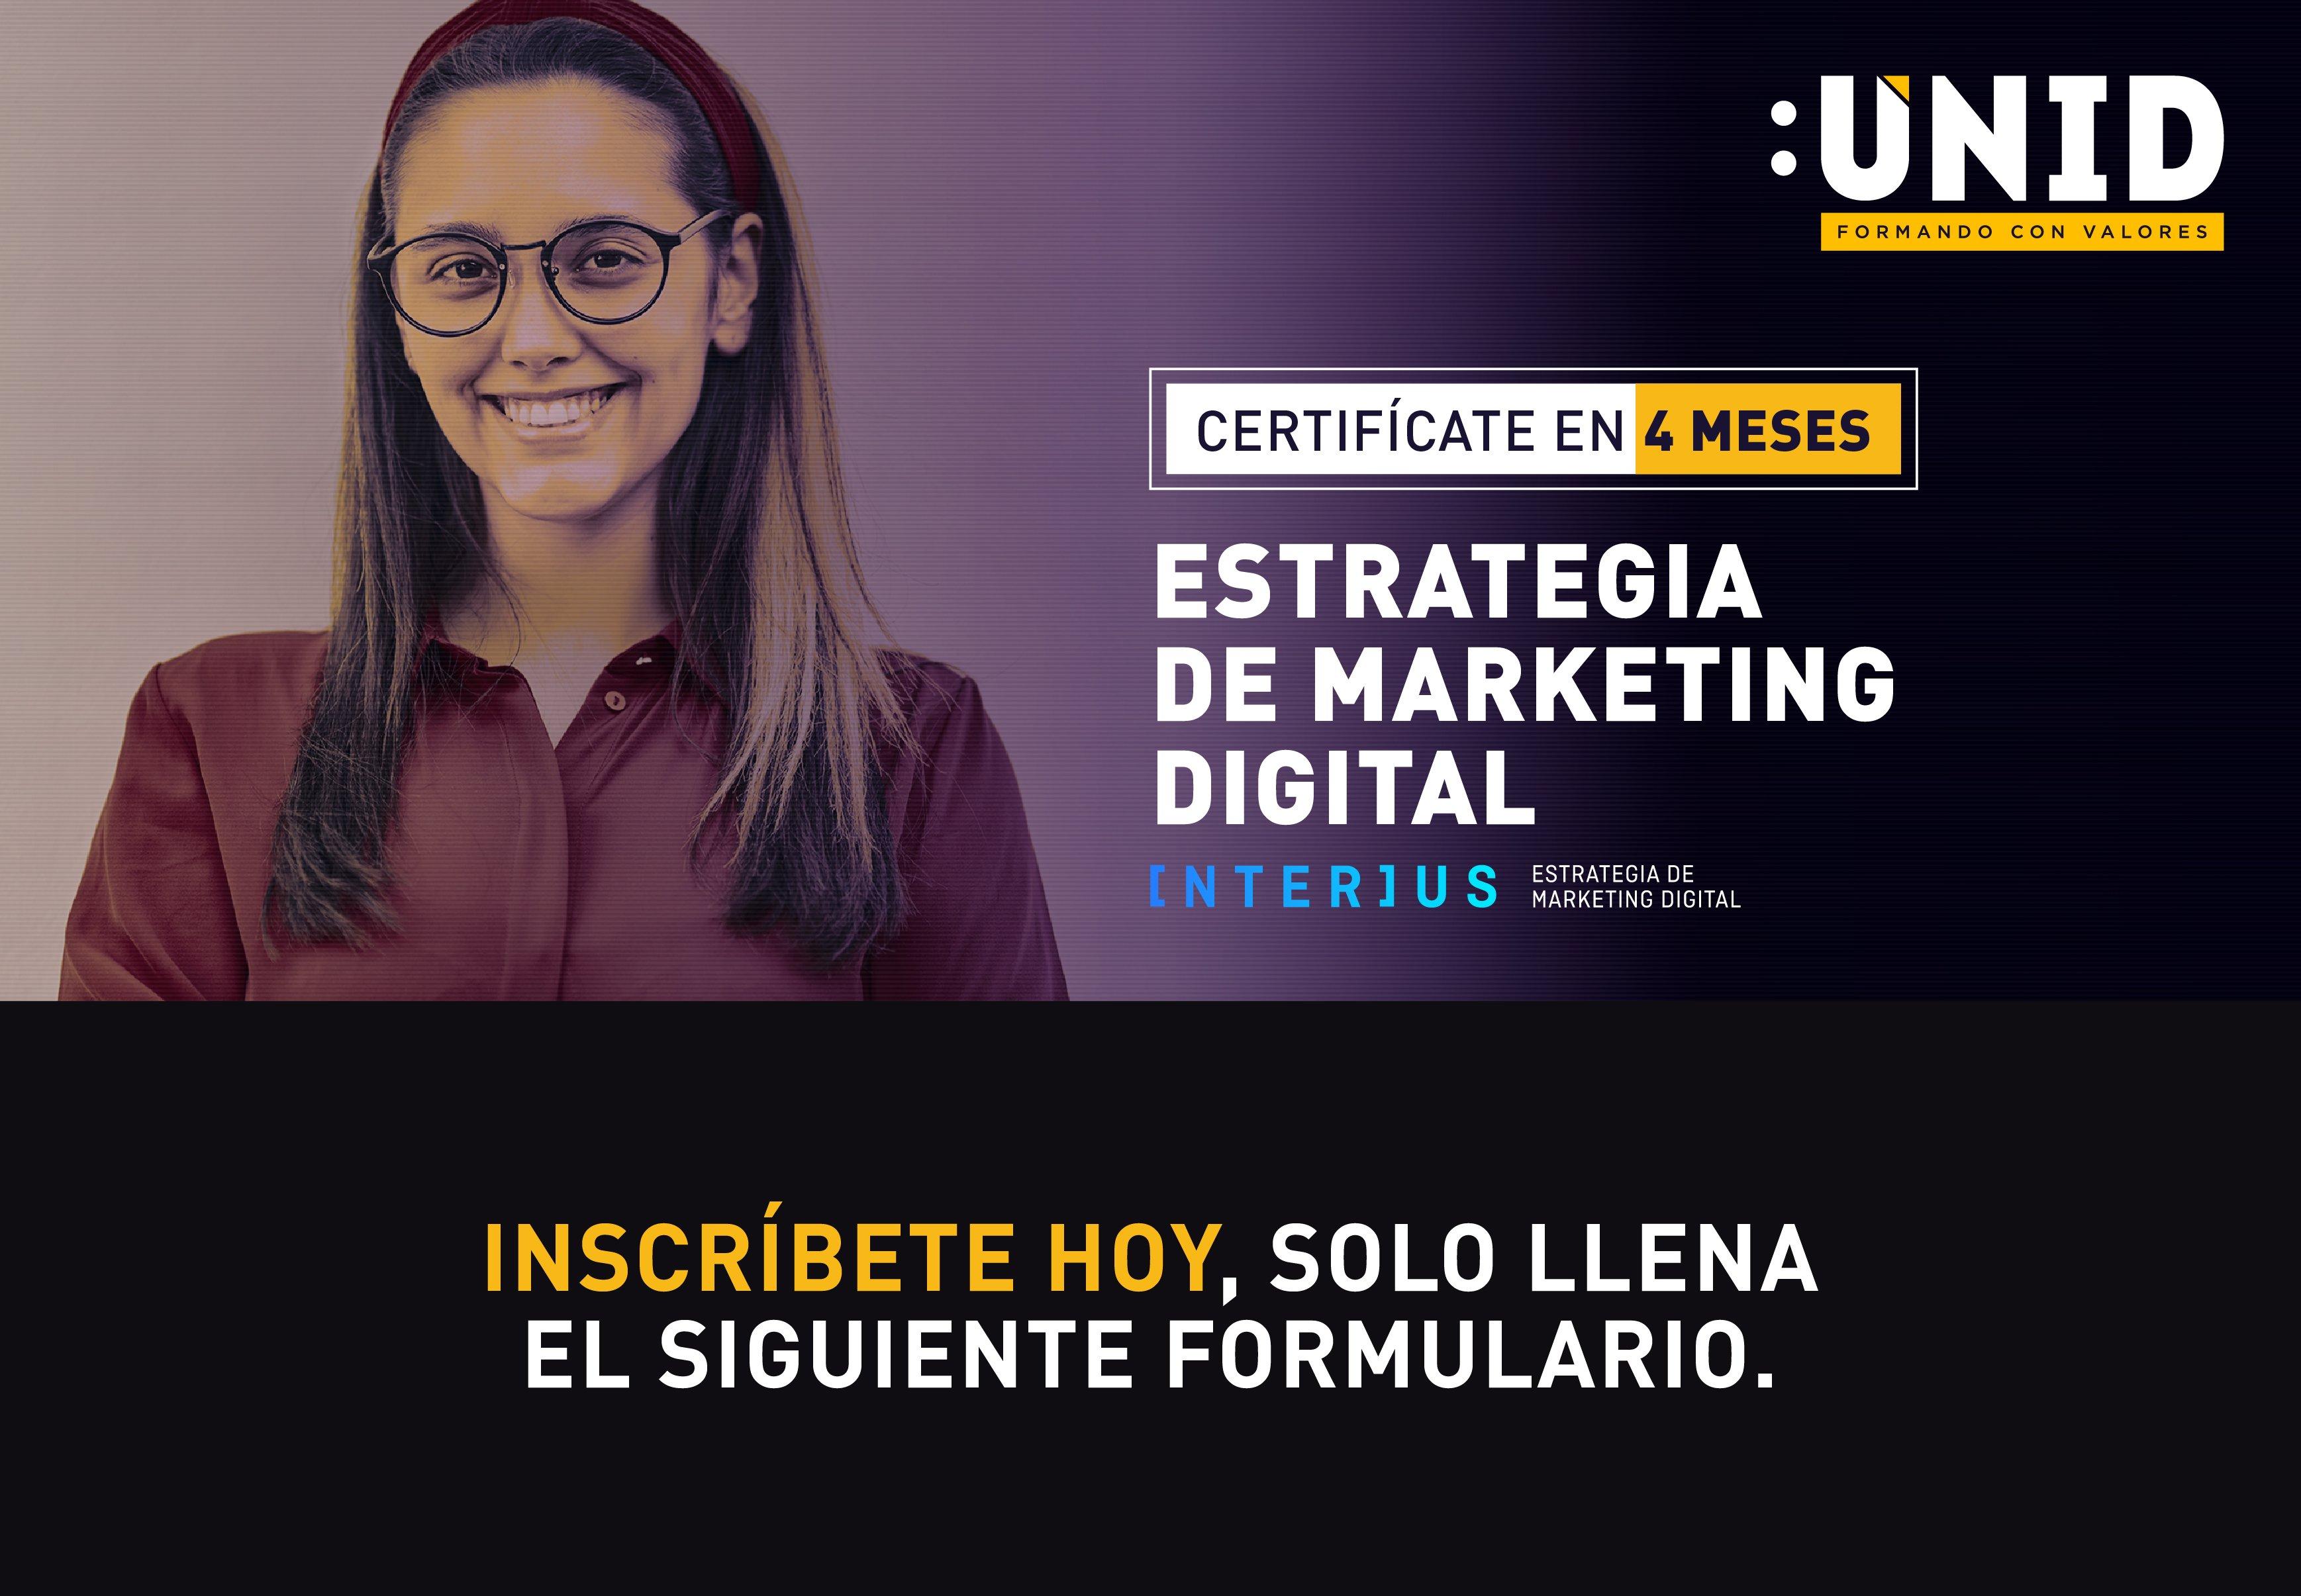 UNID LP Marketing C_LANDING 1 (2)